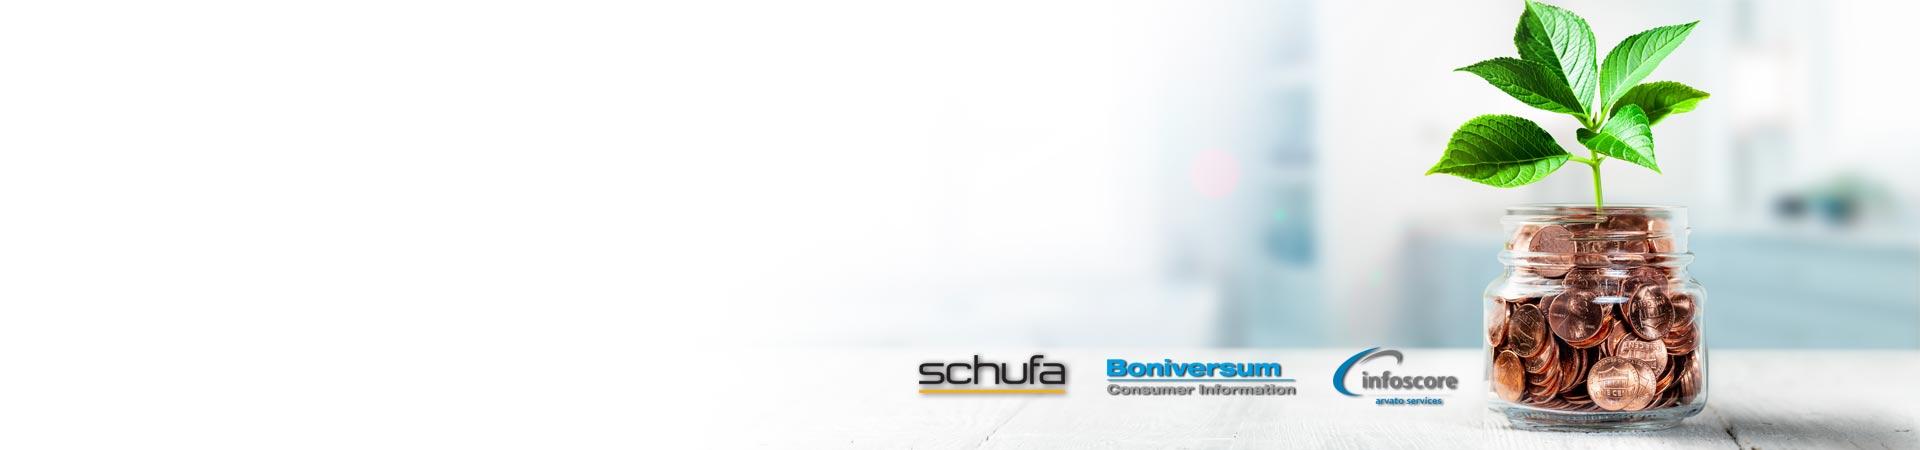 Auskunft Schufa & Co Slider